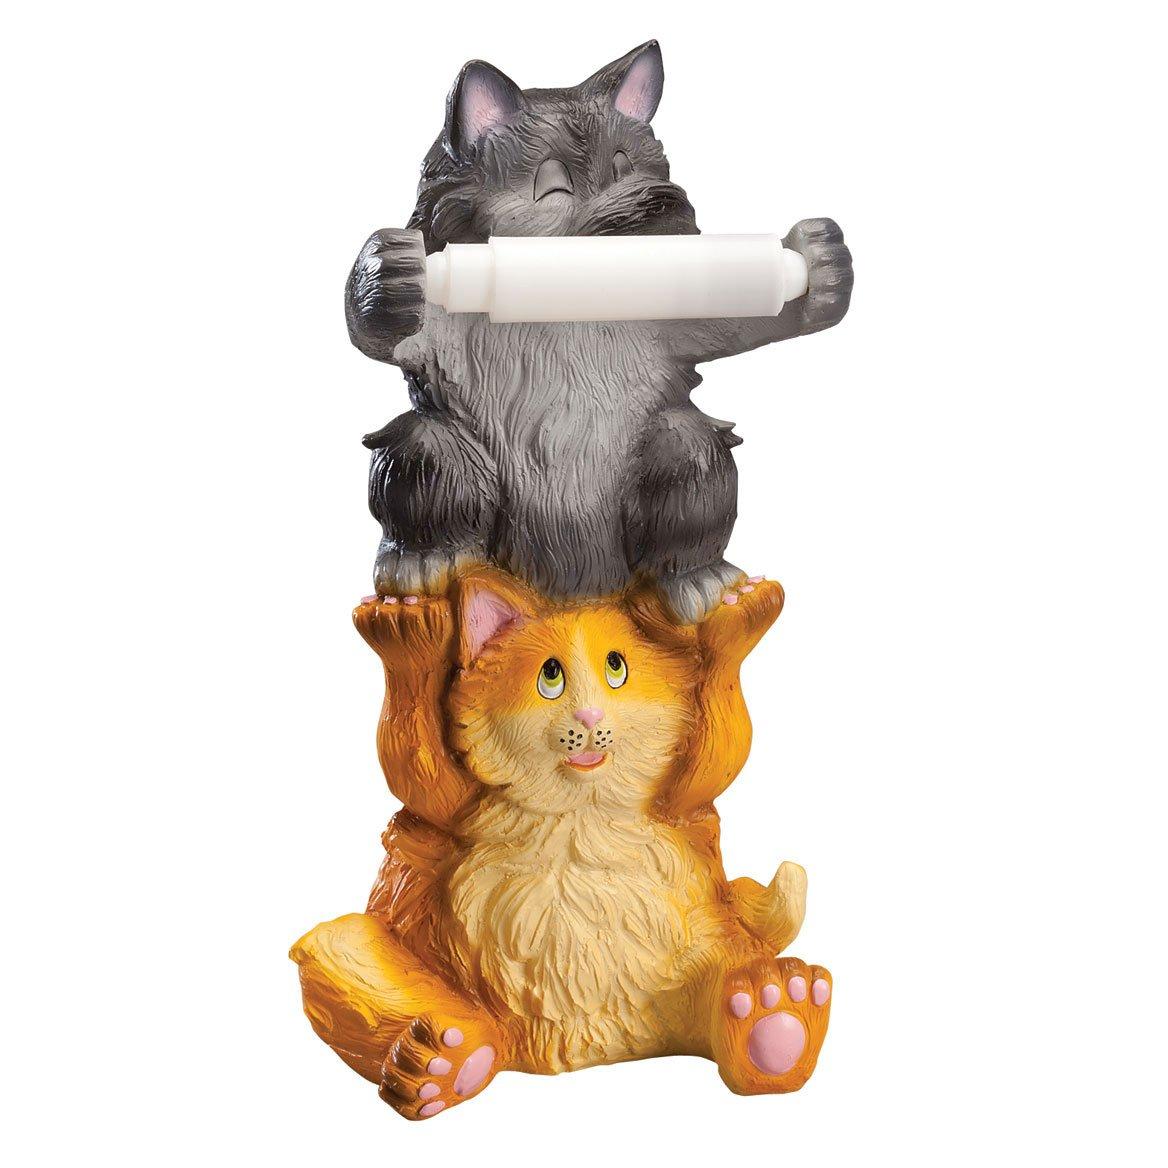 Miles Kimball Colorful Kittens Toilet Paper Holder by OakRidgeTM